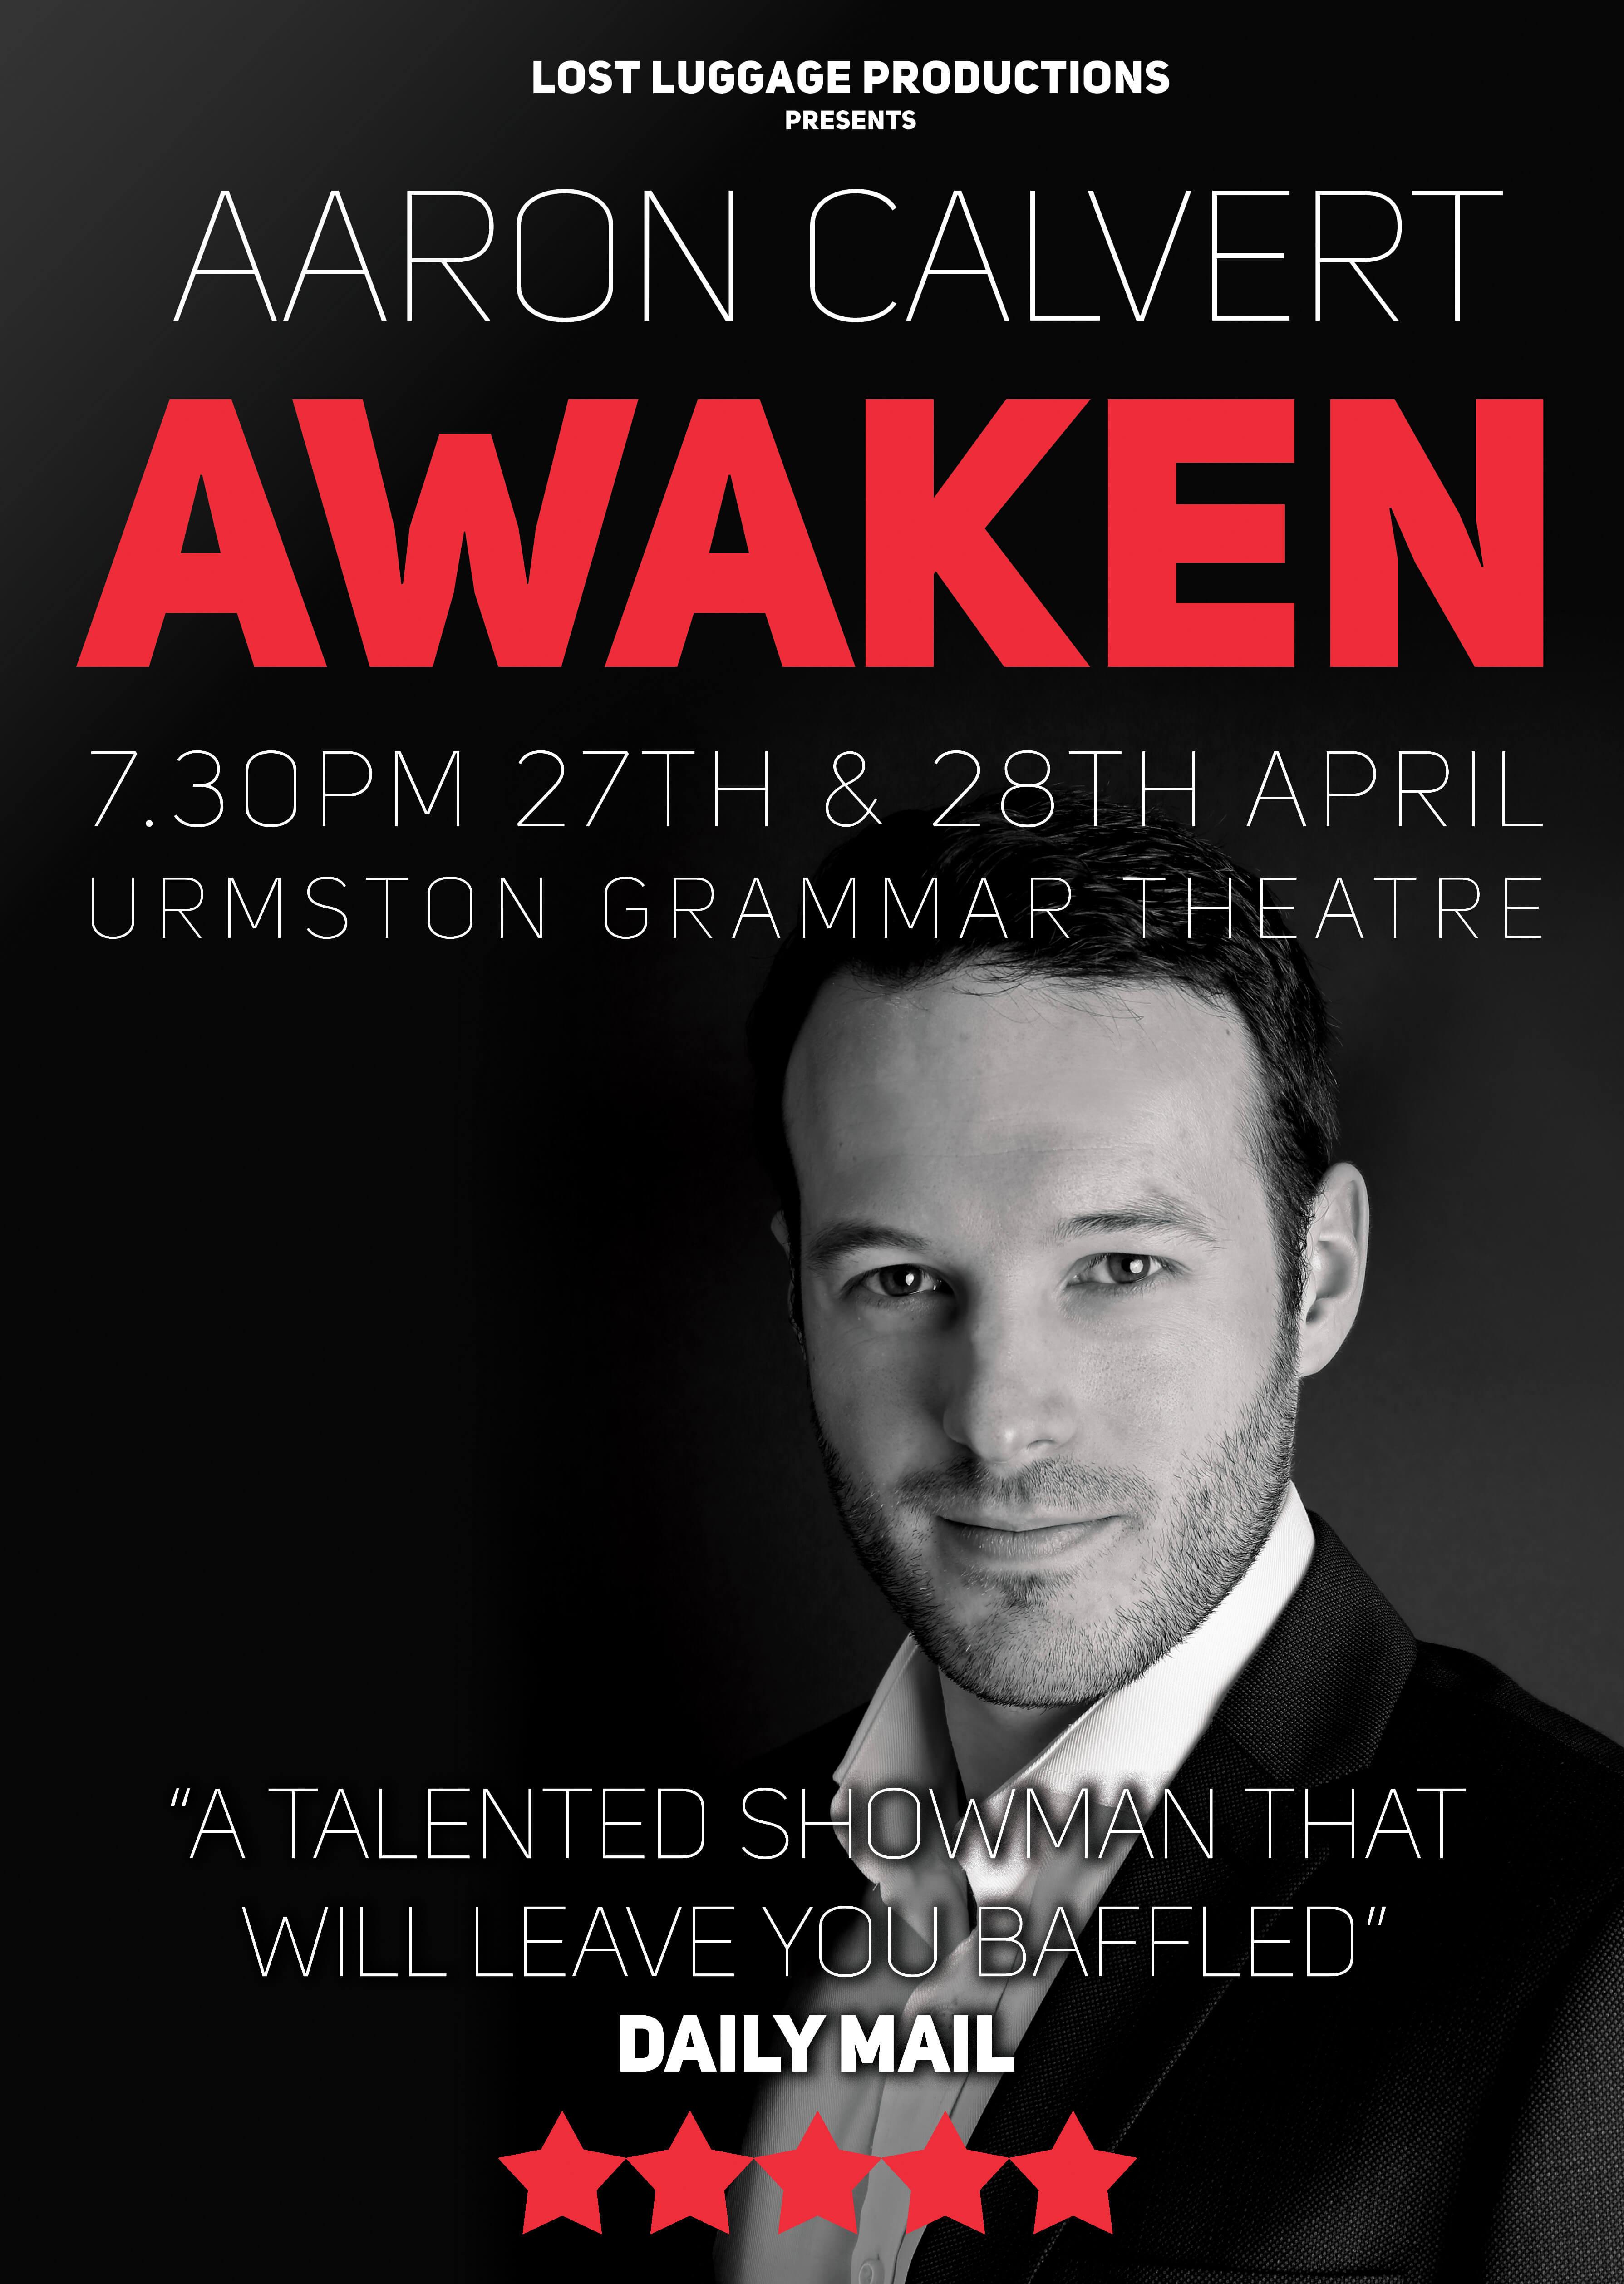 Aaron Calvert Awaken Manchester Preview